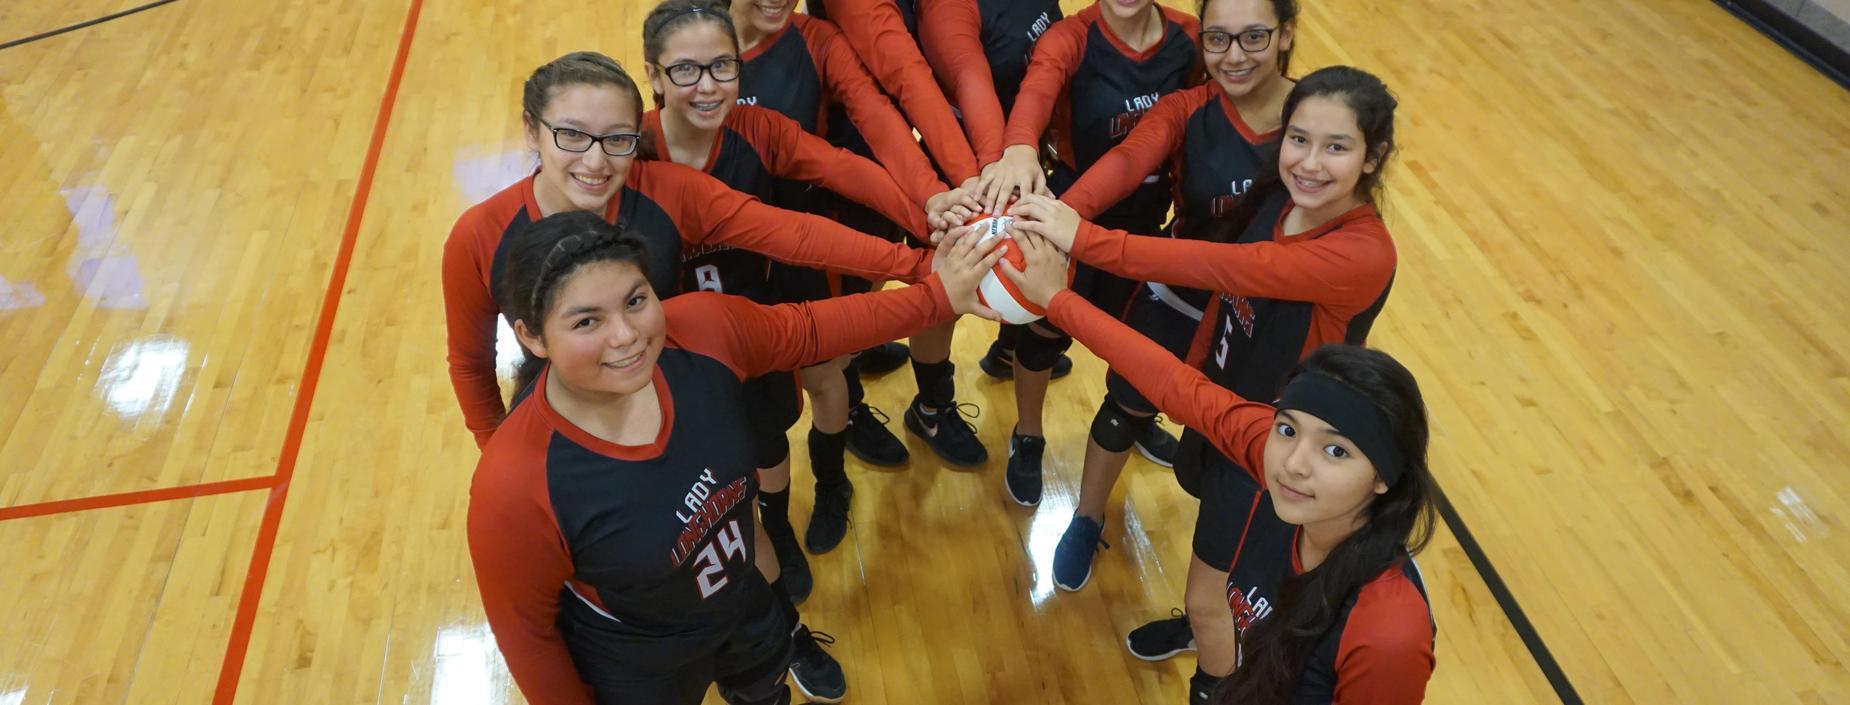 Longhorns volleyball team